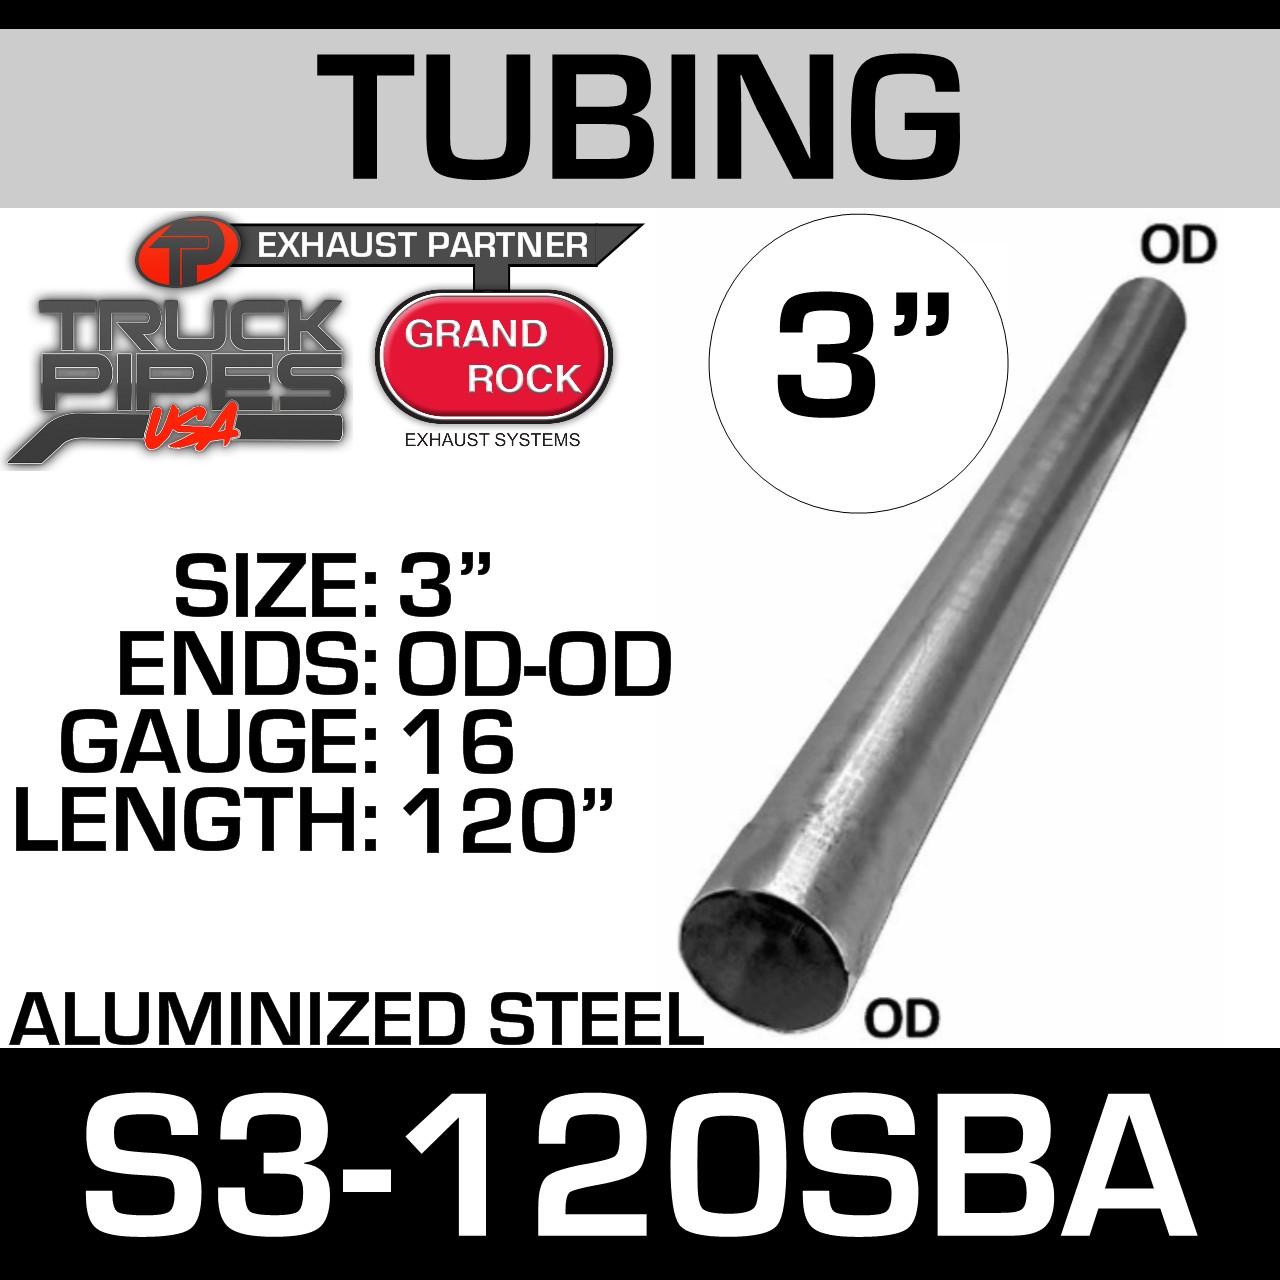 s3-120sba-aluminized-steel-exhaust-tubing-3-inch-diameter-od-end-120-inches-long.jpg